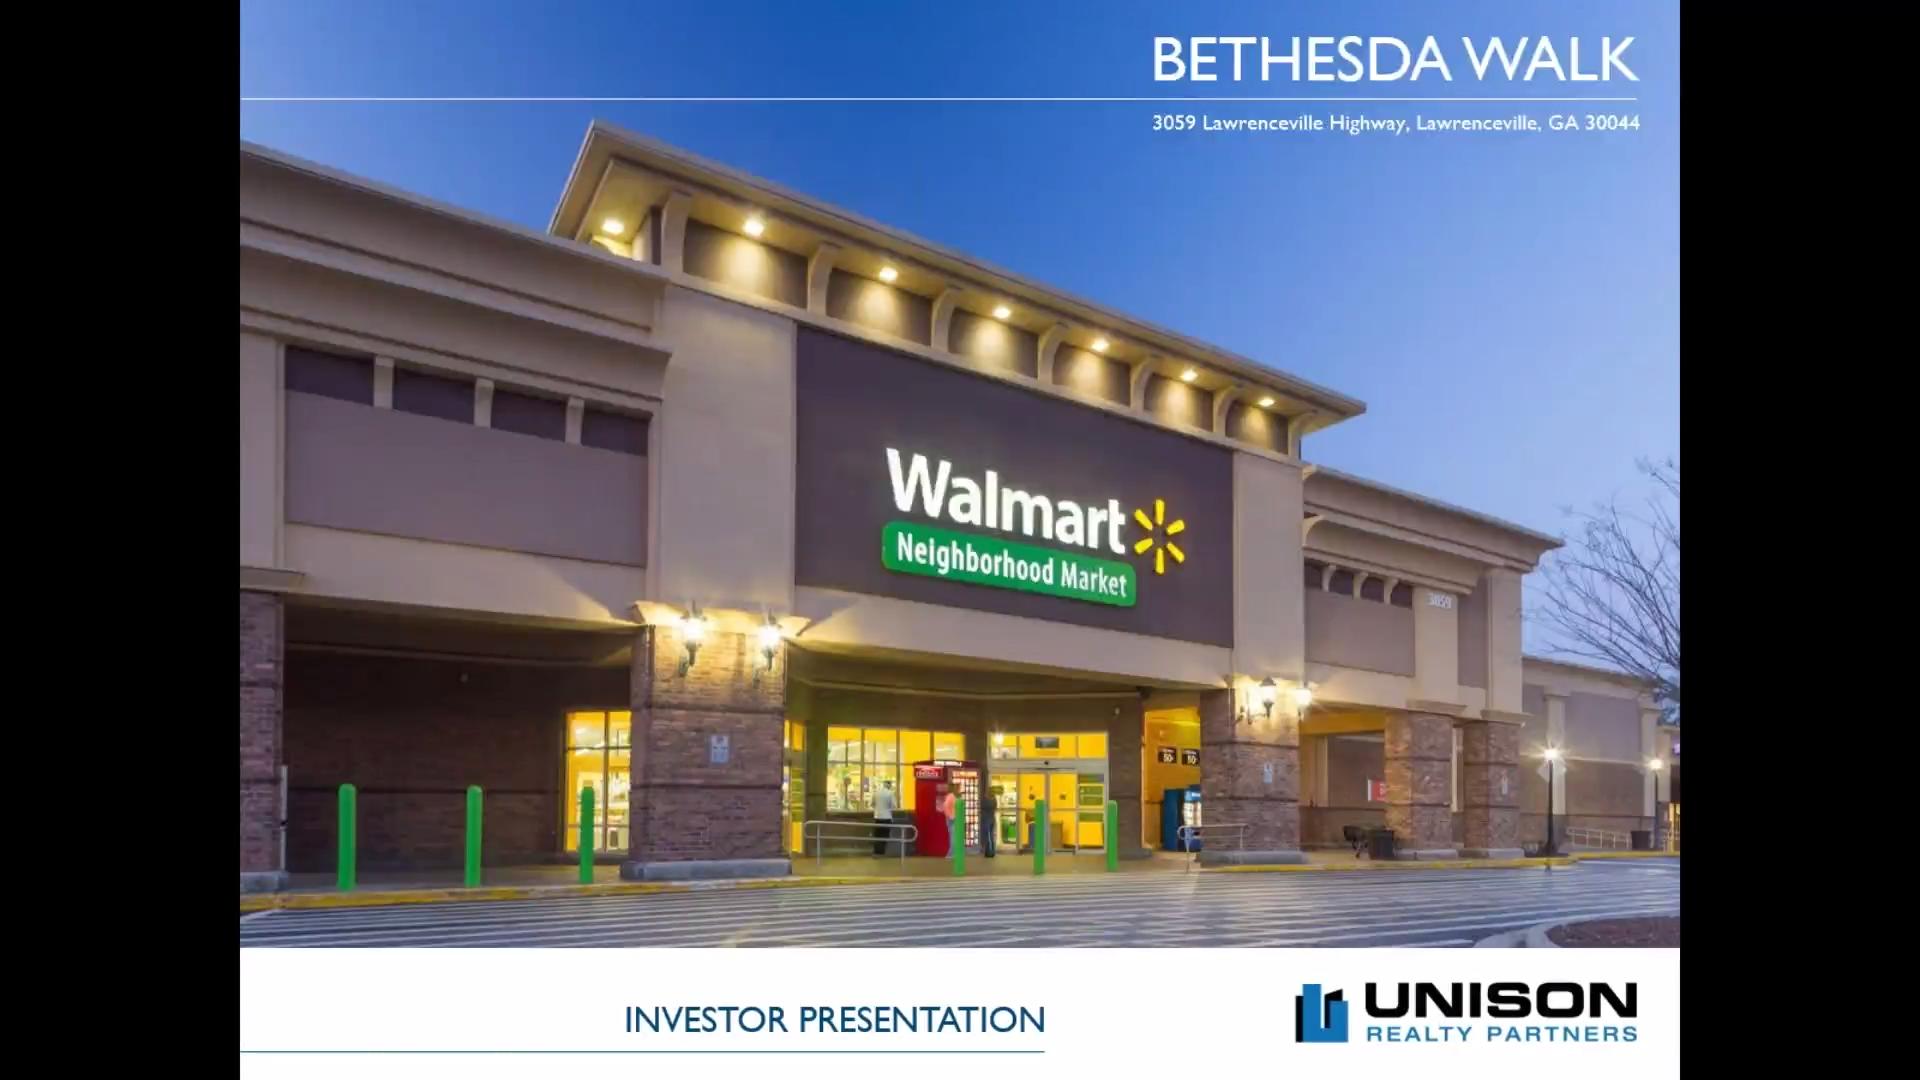 Investment Video - Bethesda Walk Shopping Center